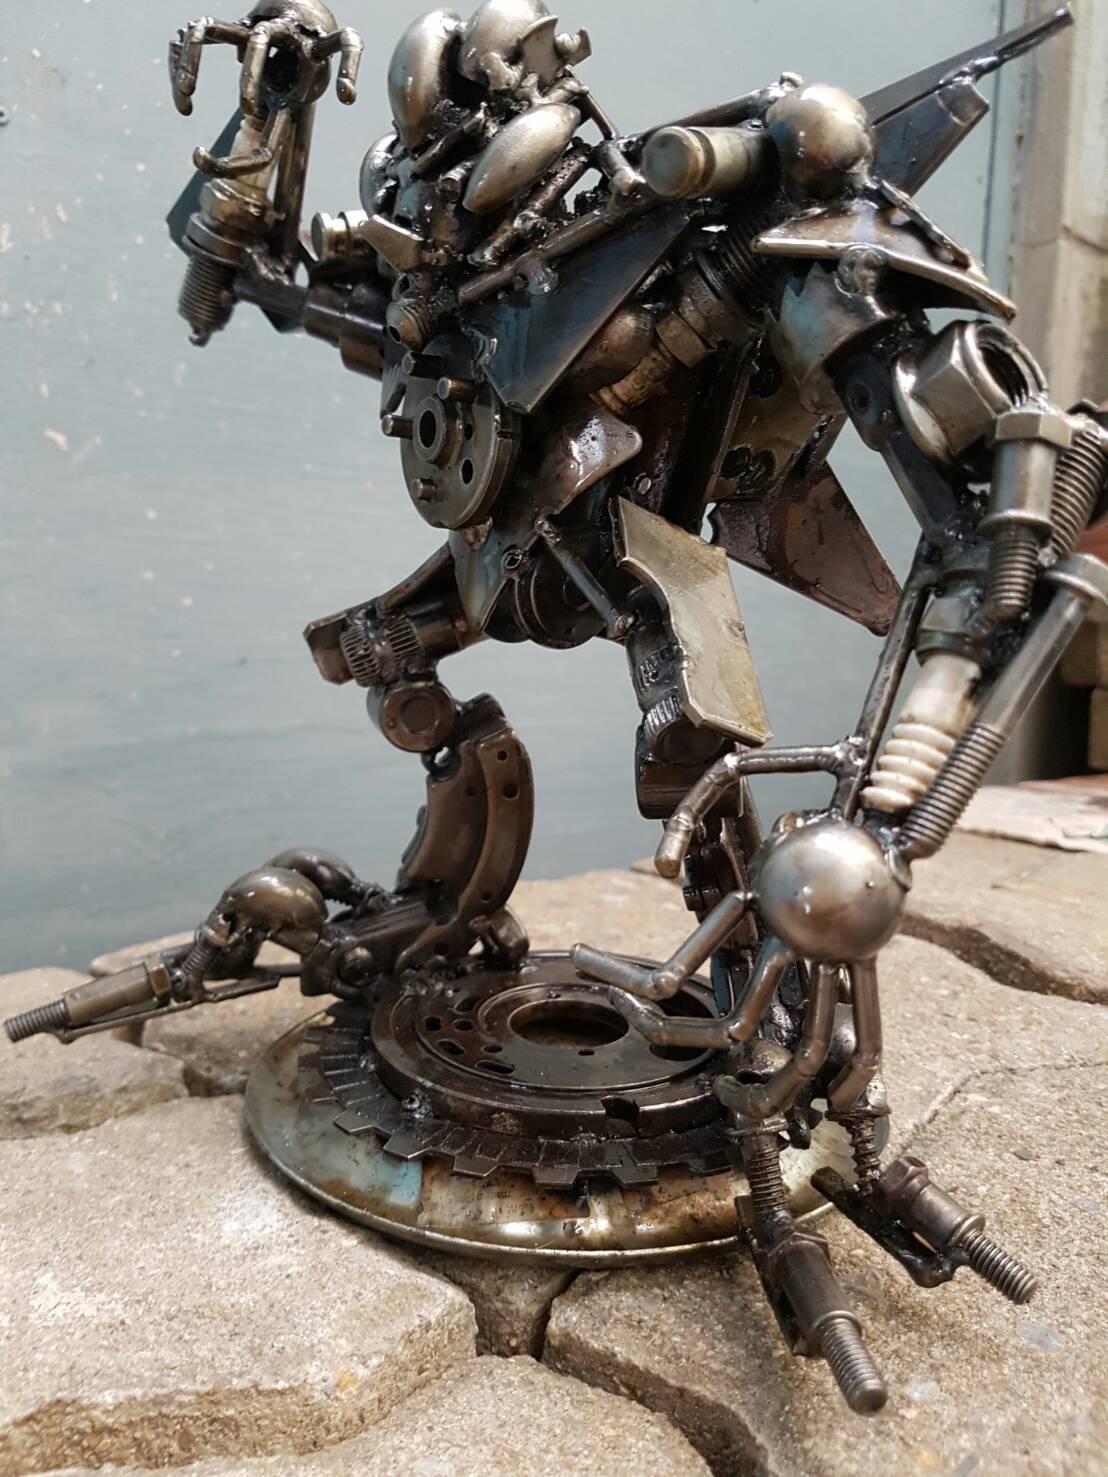 Transformers, araña Roja, astilla de hierro, escultura, papel a mano